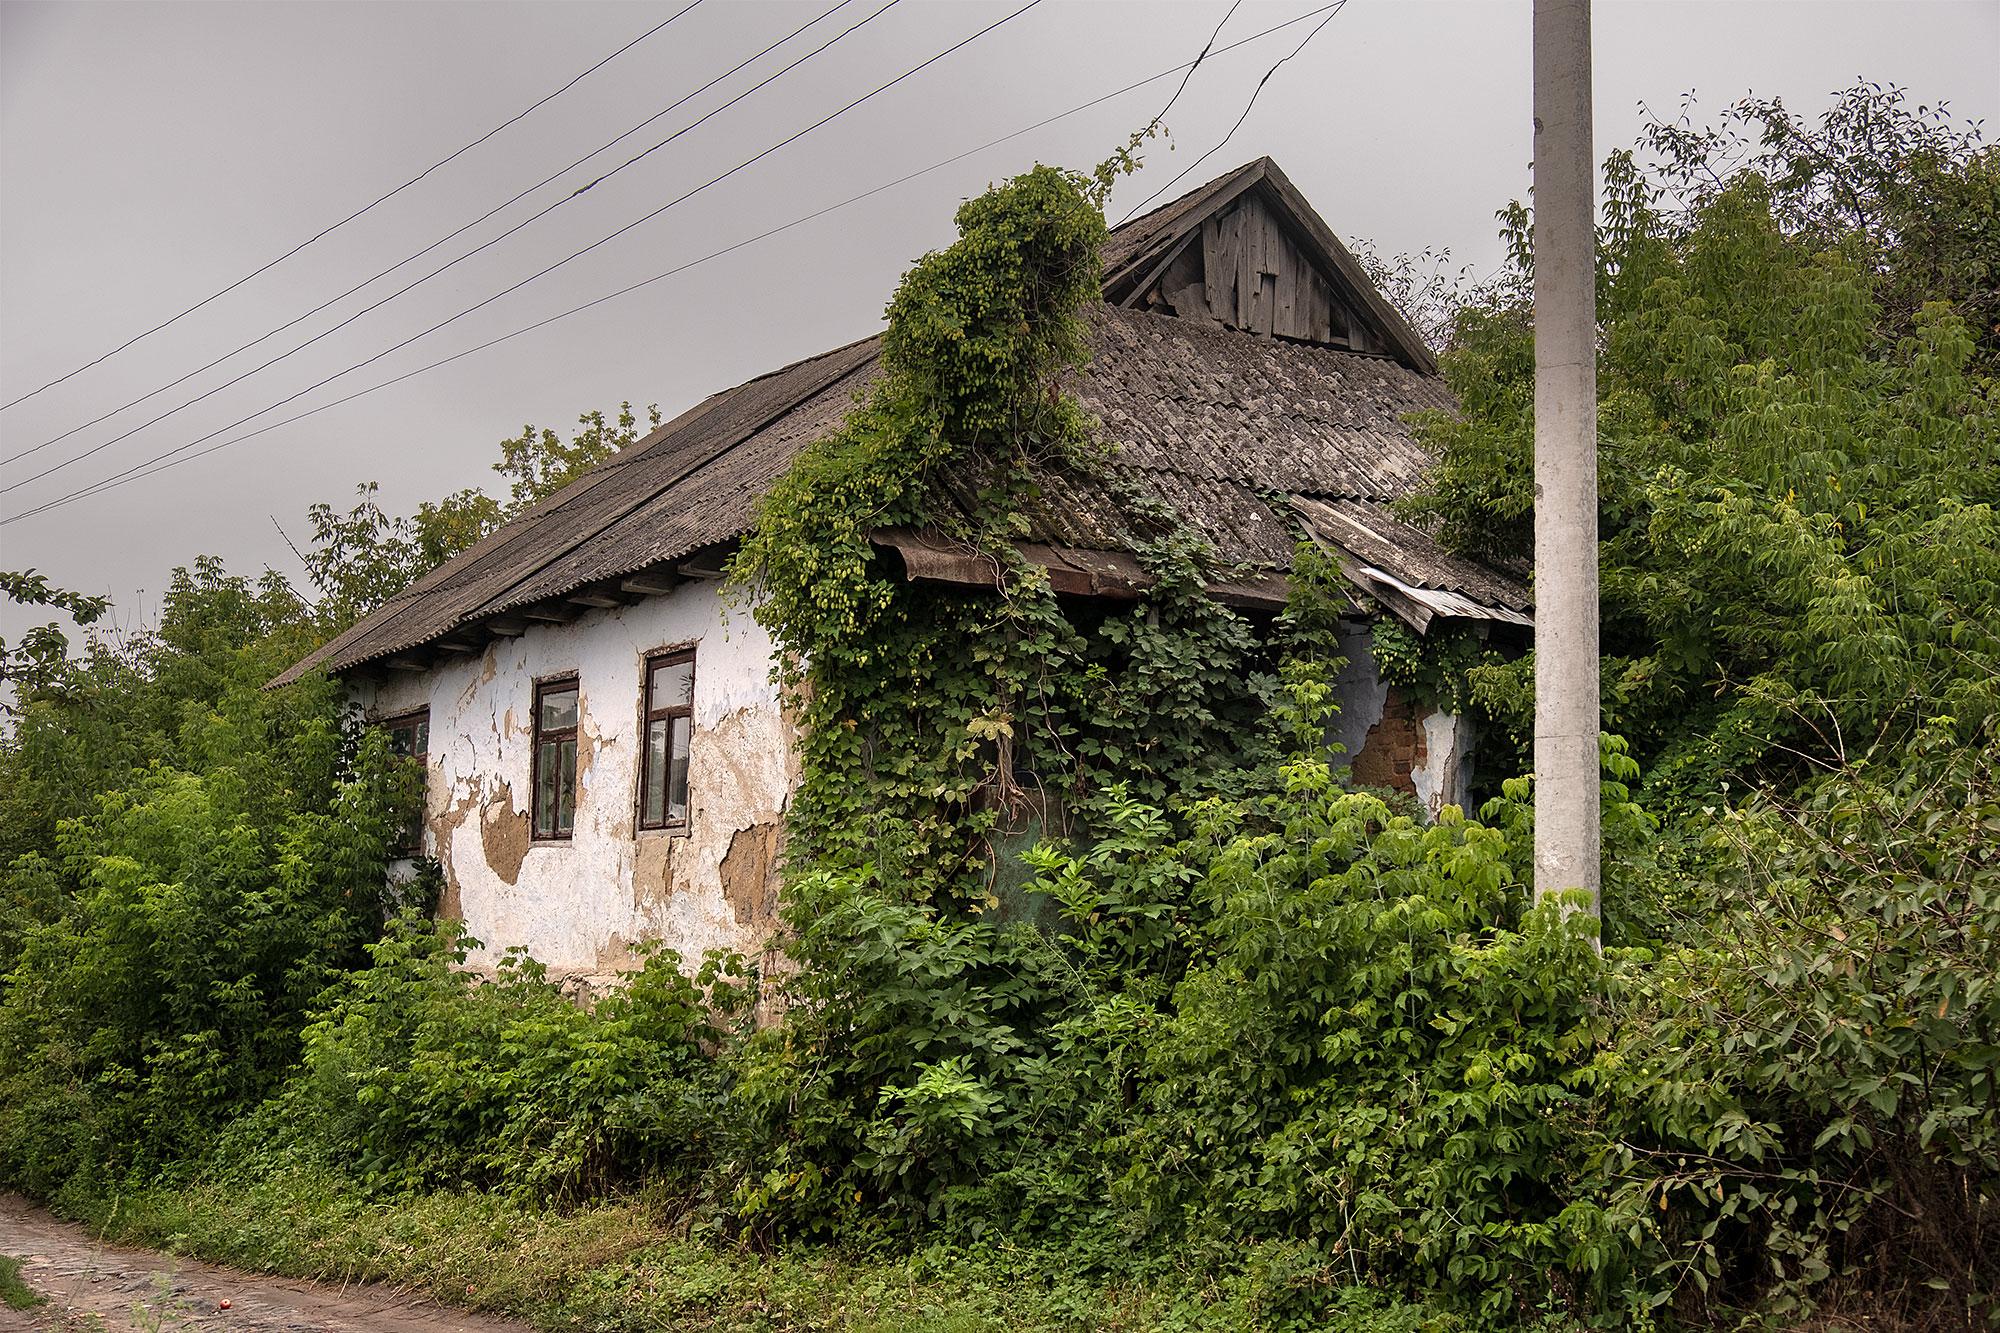 Chernivtsi (Podolia) - former Jewish neighbourhood